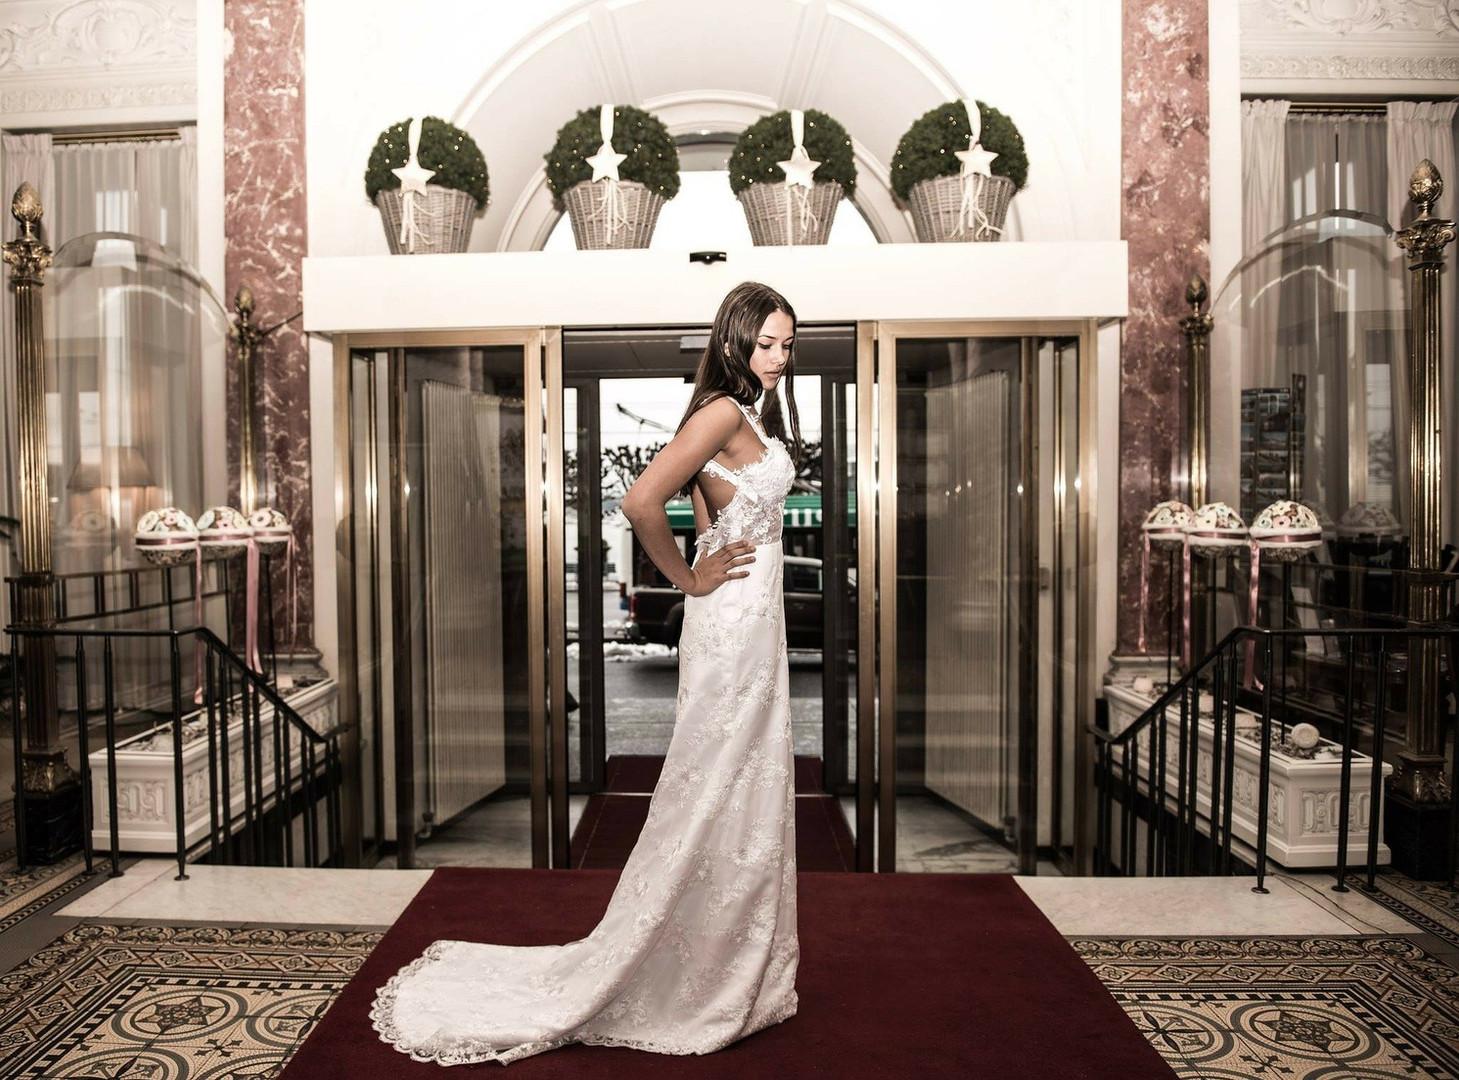 Wedding Bride in Hotel.jpg